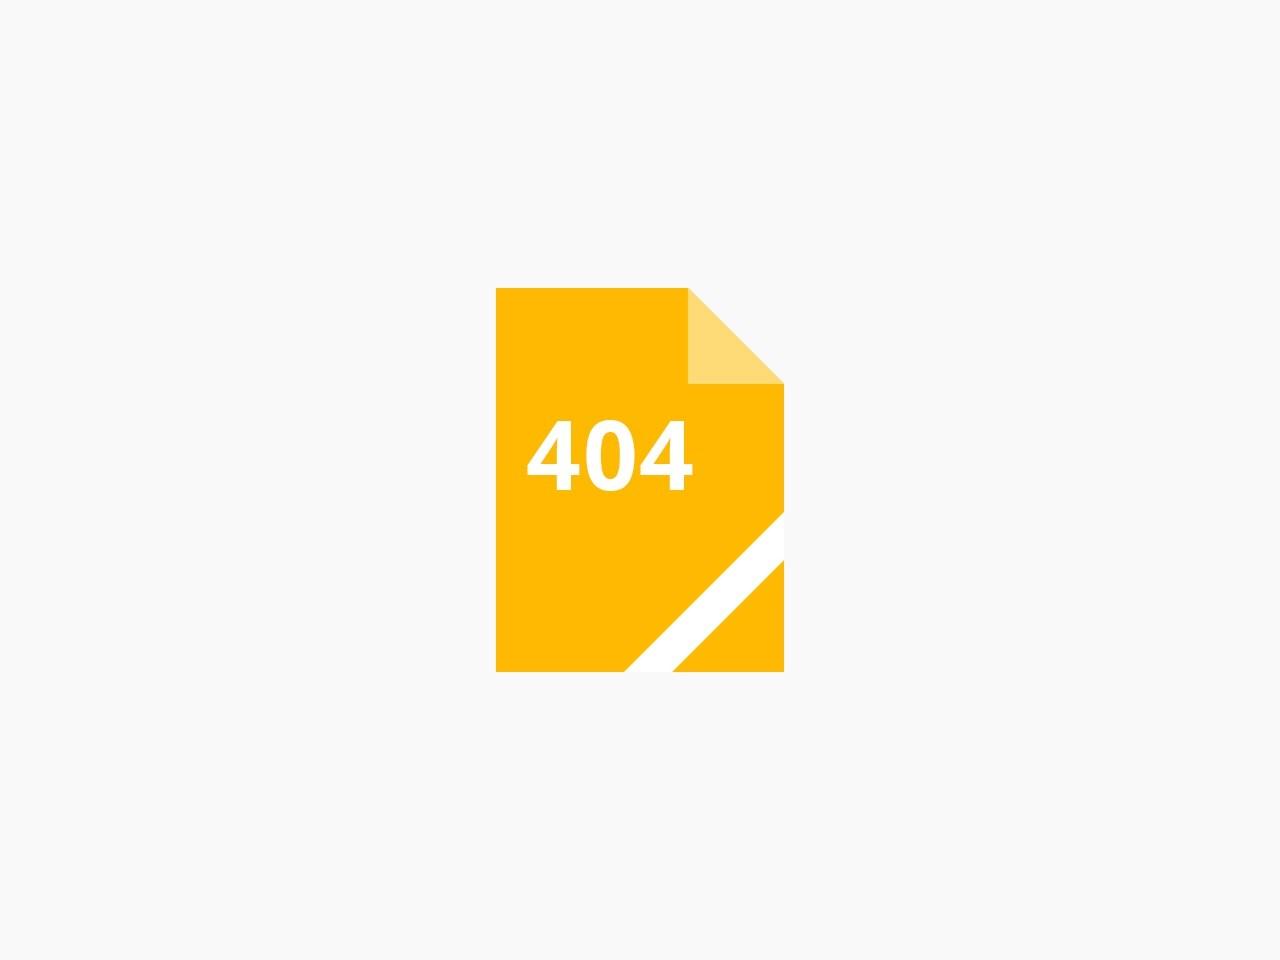 http://www.city.kushiro.lg.jp/kurashi/kouen/k_ichiran/yamahana/0002.html